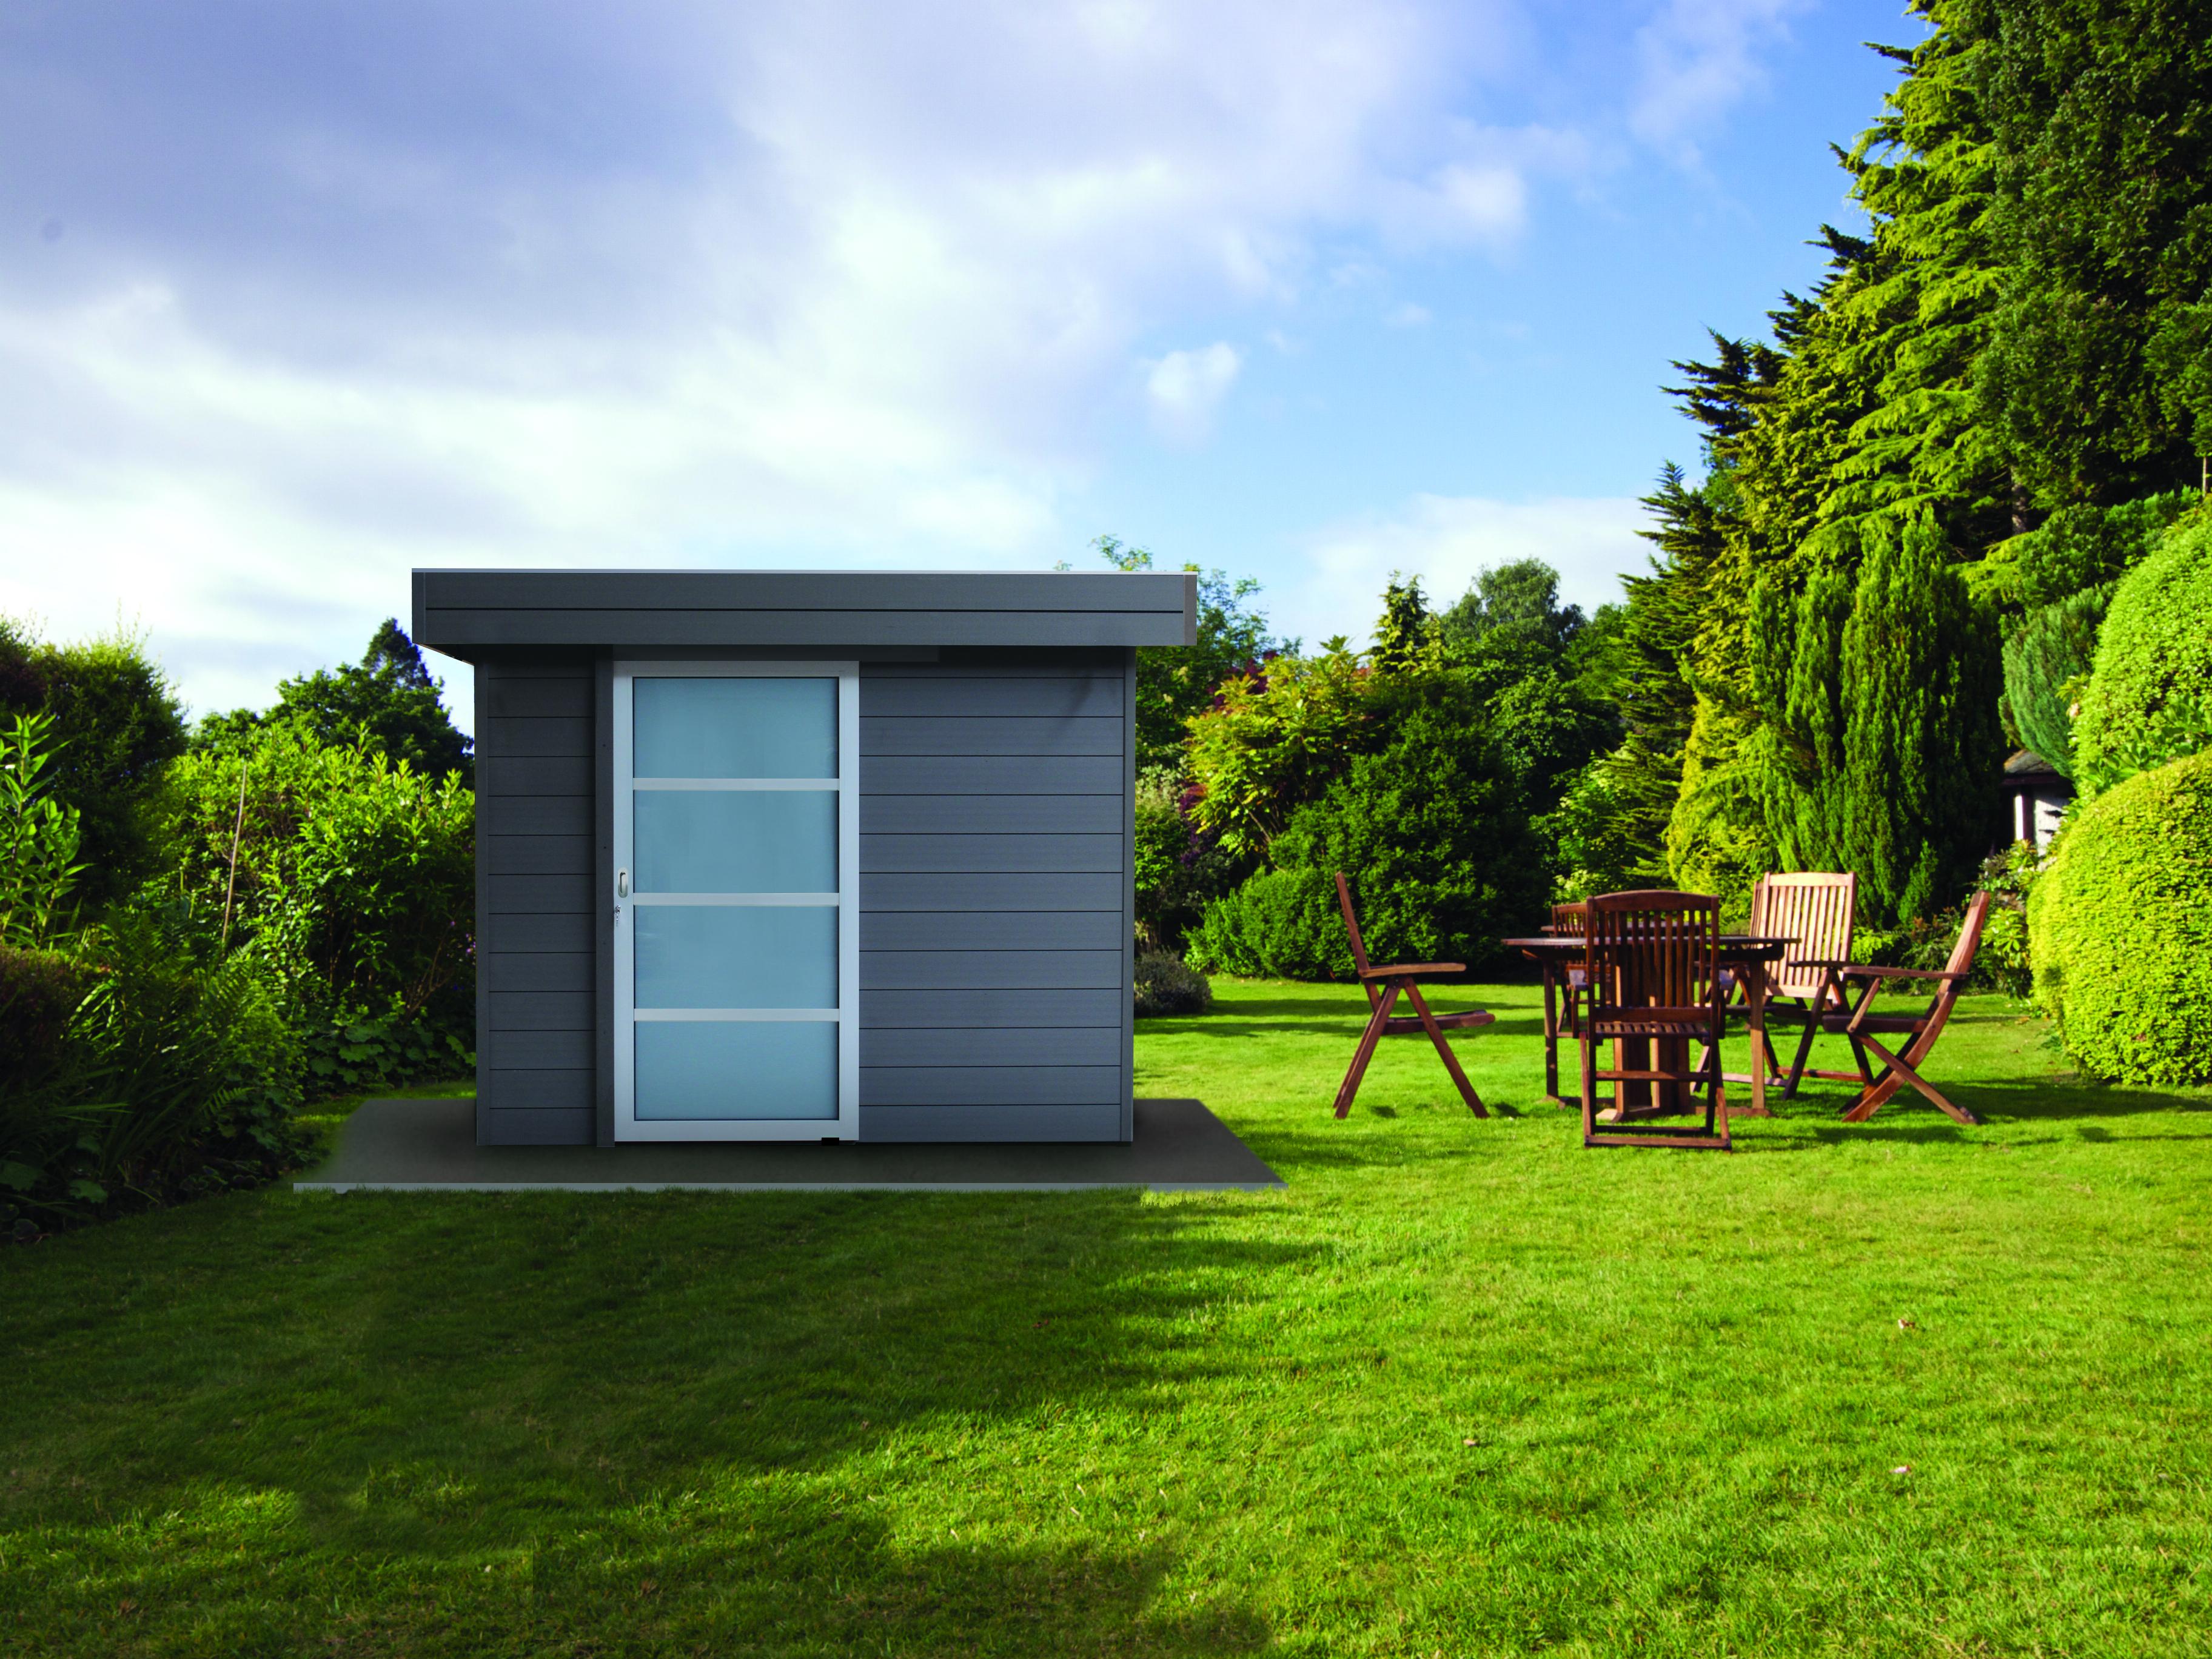 Gartenhäuser Pavillons Garagen | Lance | Holz | Bois | Scierie ...